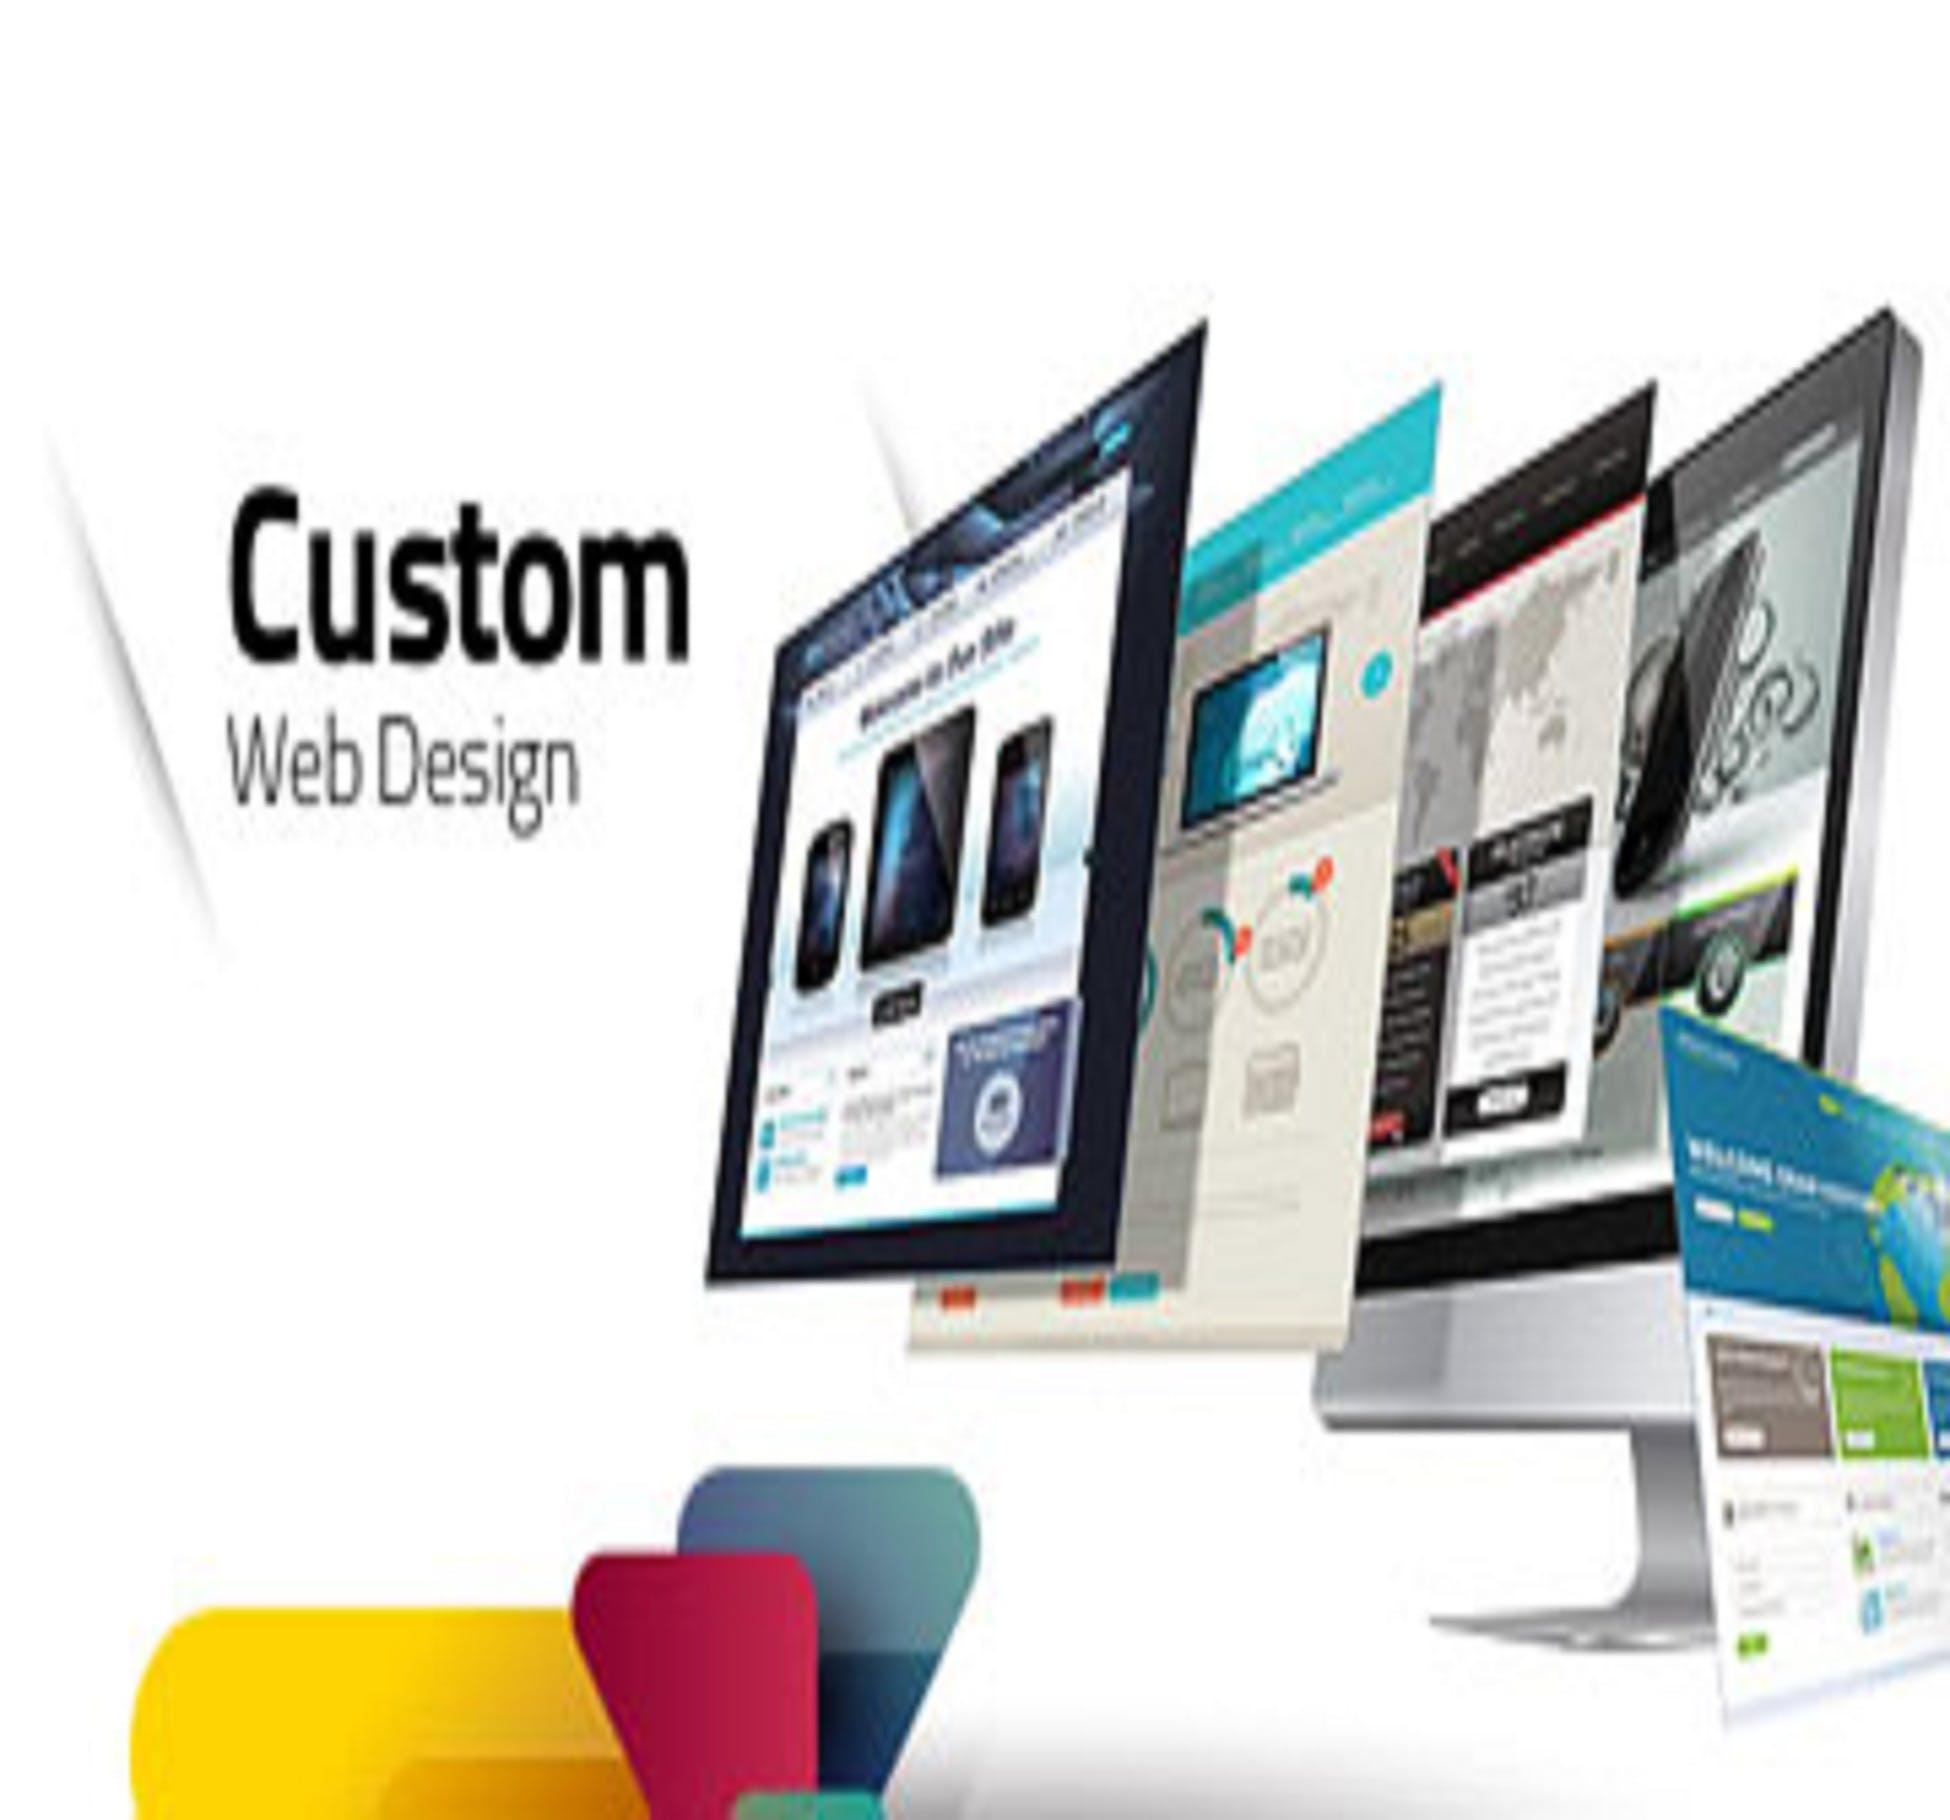 custom website designing company usa, Web design firm, web designing firm usa